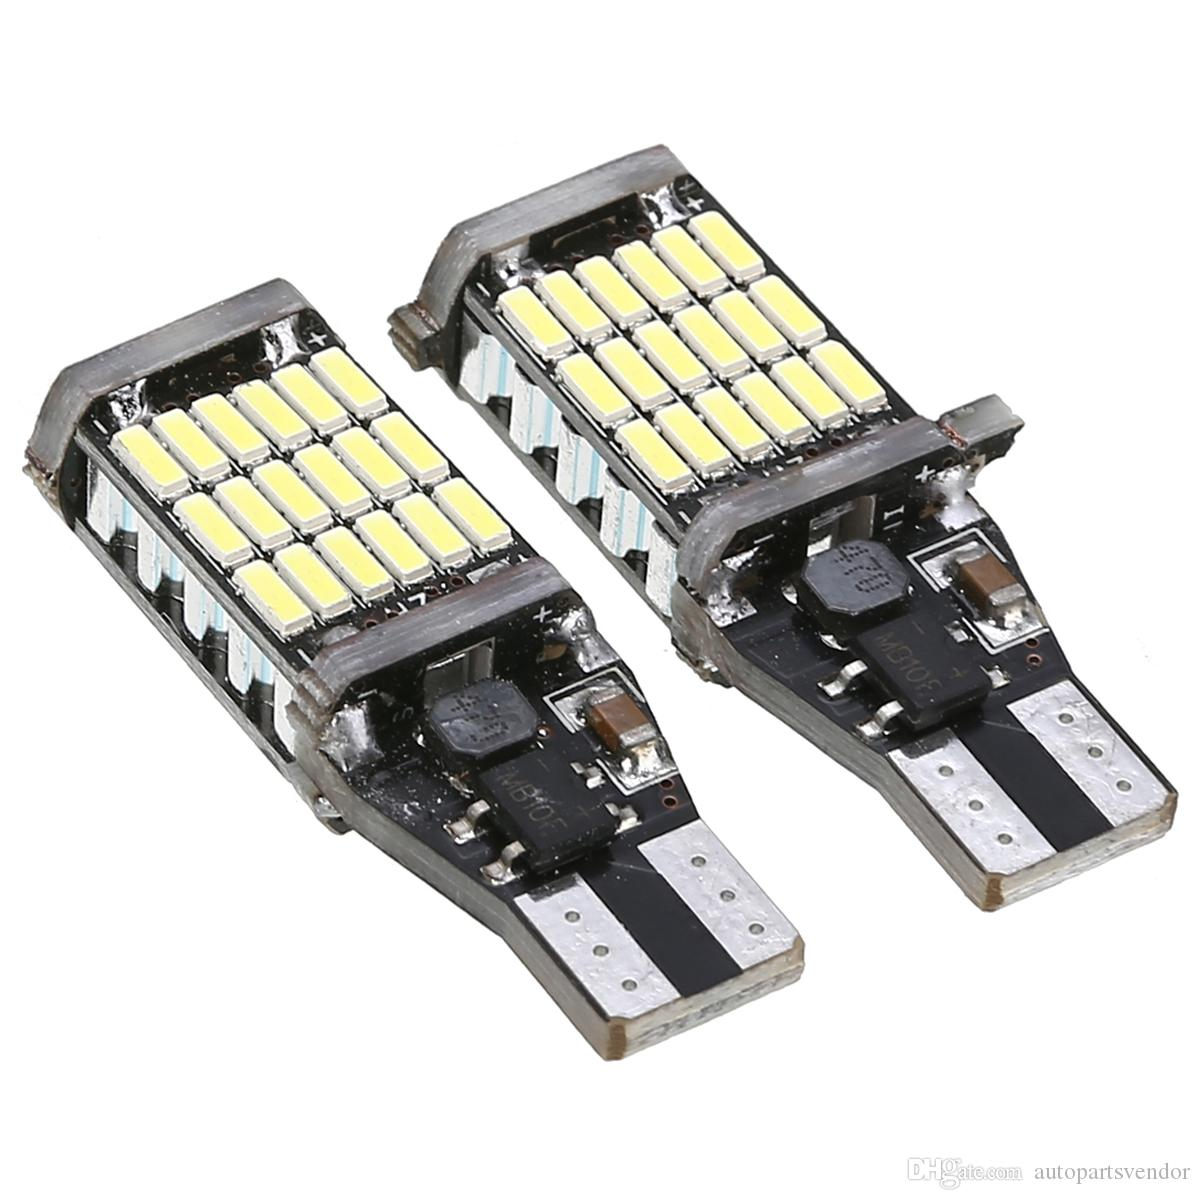 10 Ad T15 T16 W16W LED Ters Ampul 920 921 912 CanBus 4014 45SMD Vurgu LED Yedekleme Park Işık Lambası Ampüller DC12V